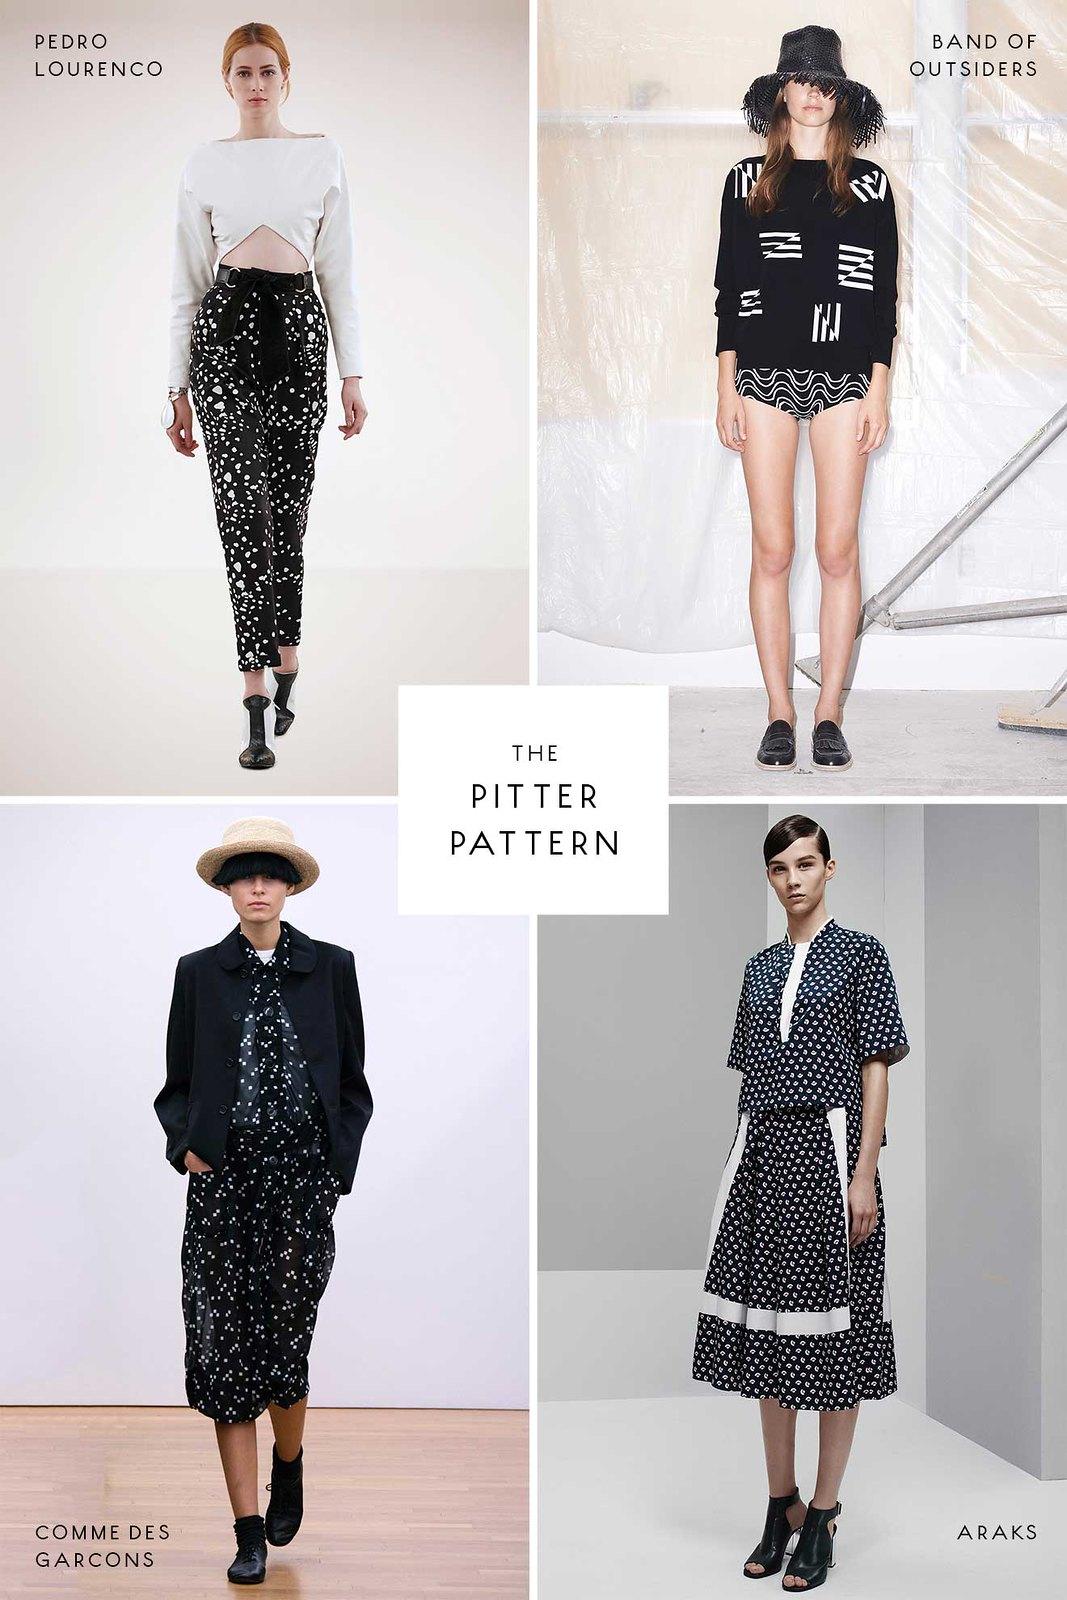 miss-moss-ss15-pitter-pattern